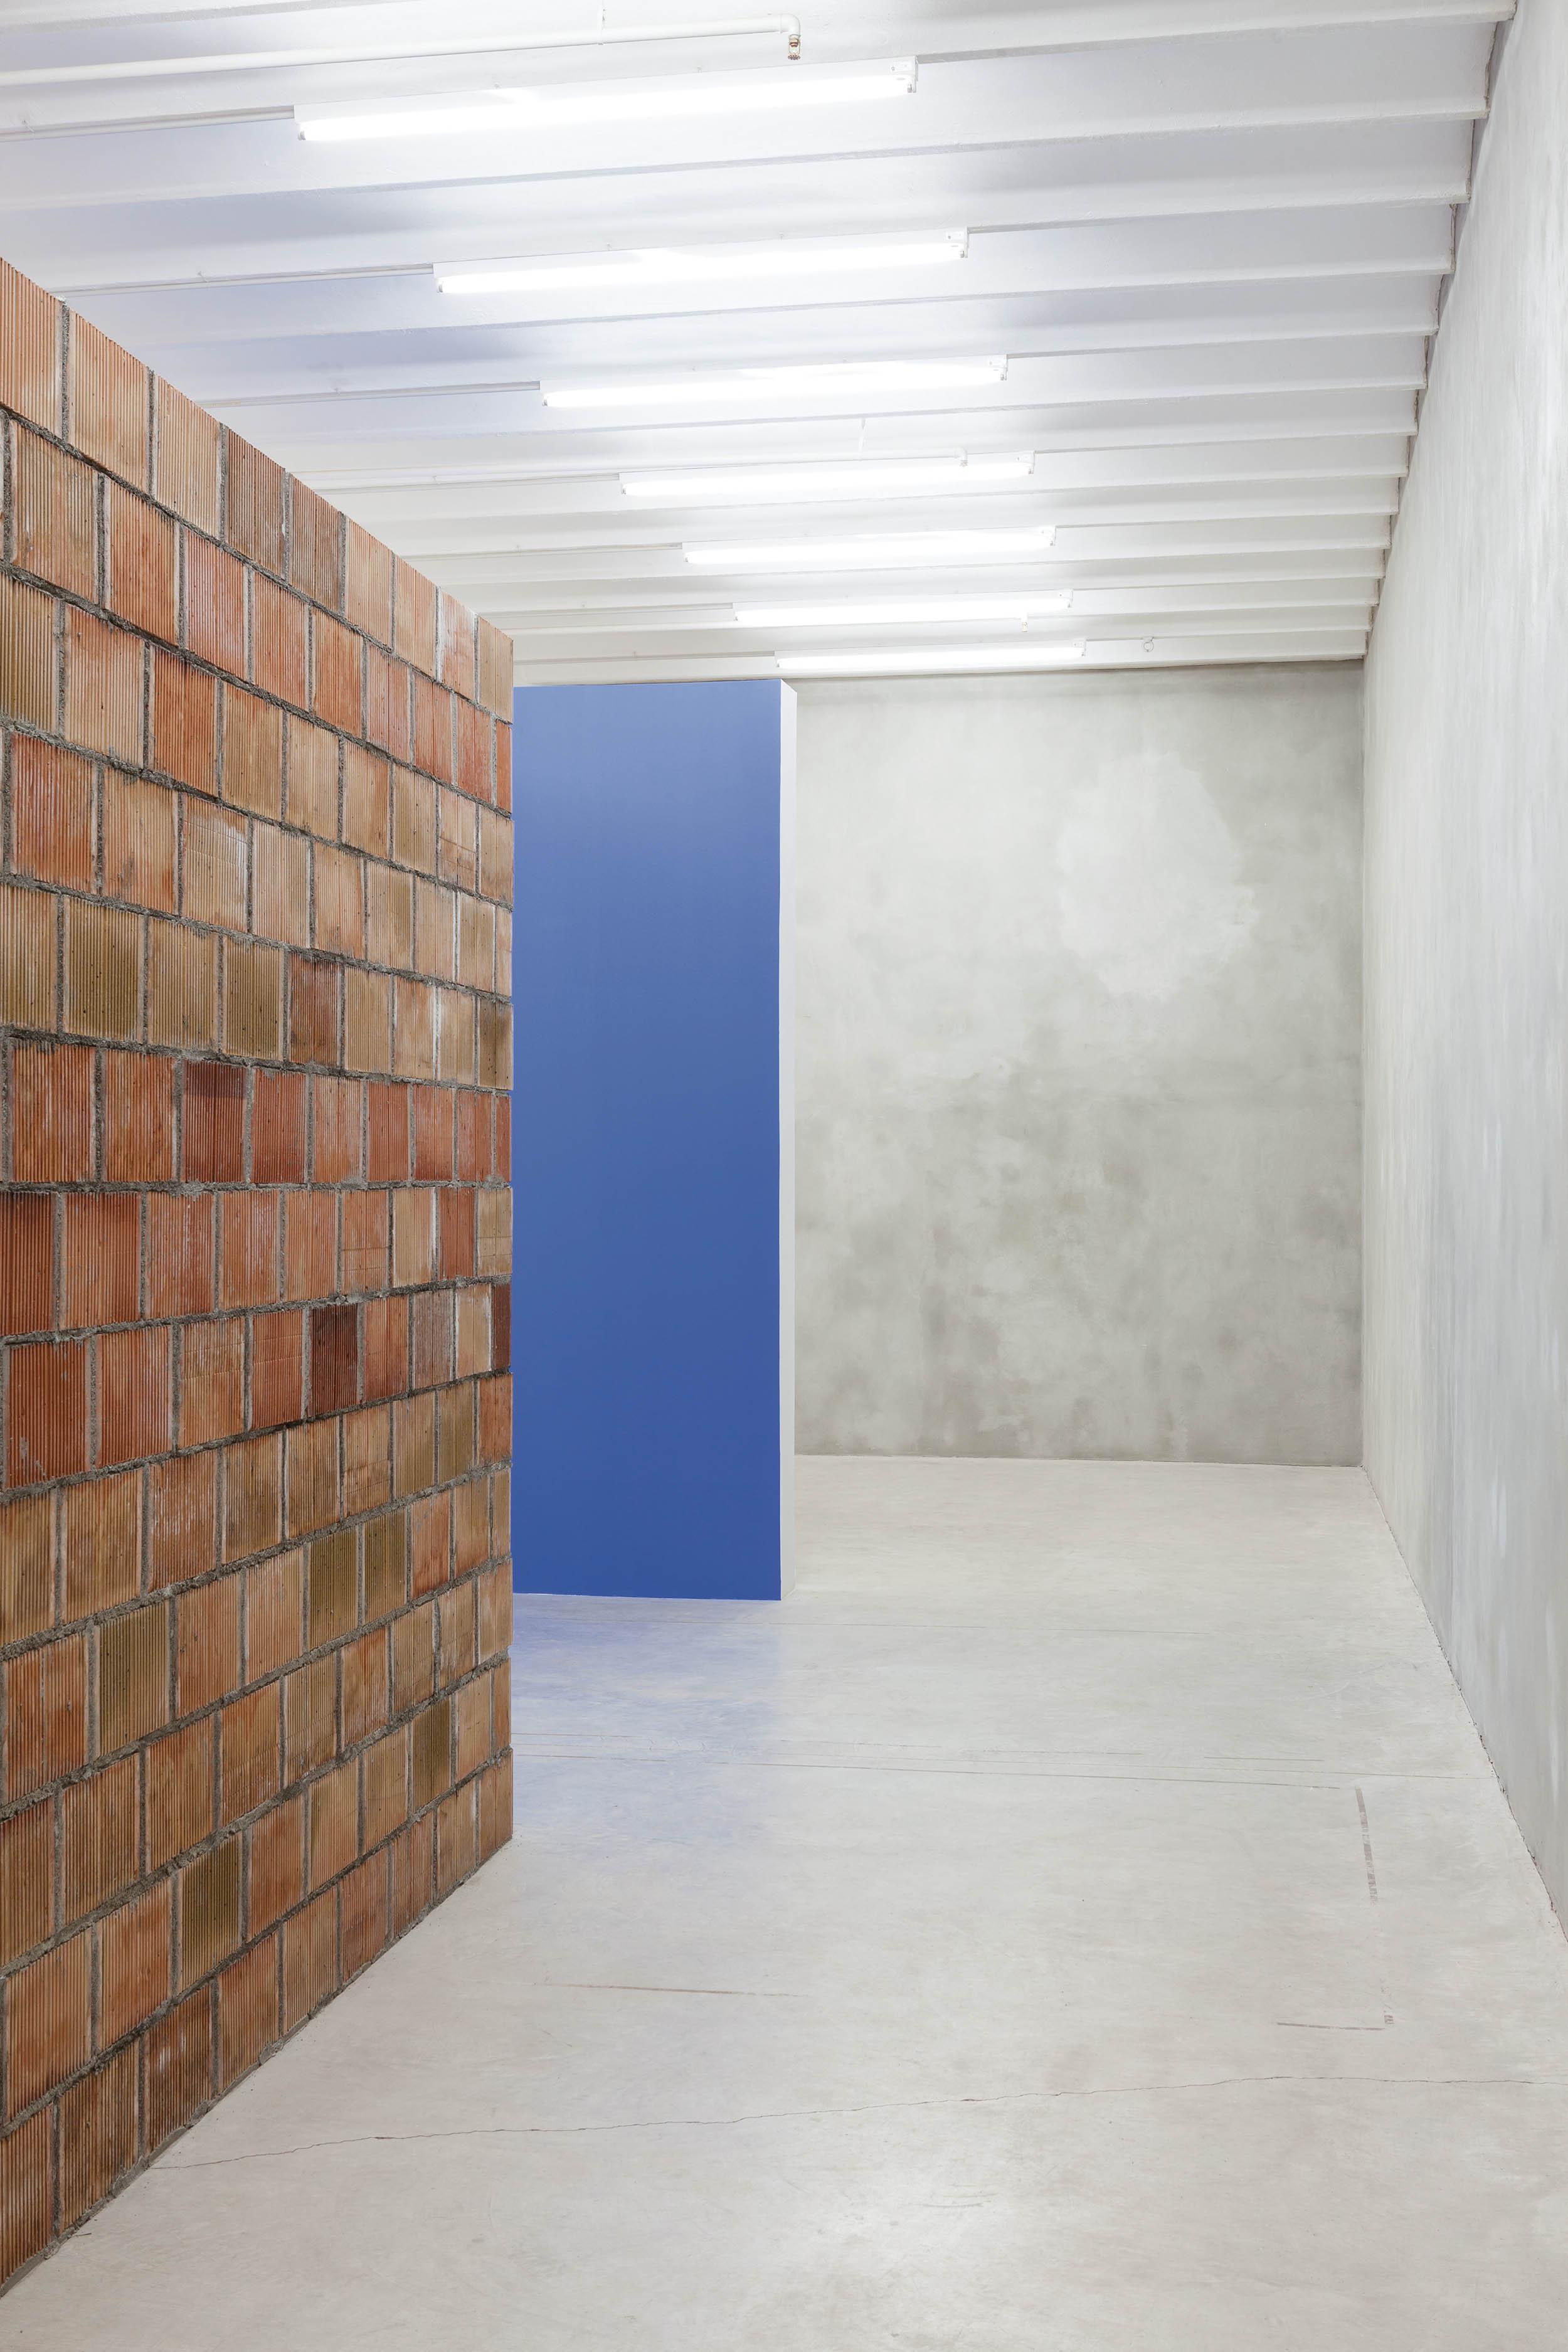 5 - Pieter Vermeersch at Blueproject Foundation Barcelona